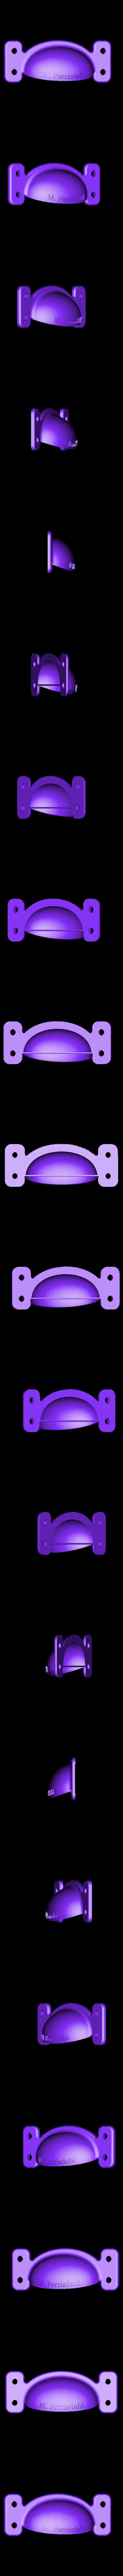 greb 2.STL Download STL file Drawer Pull • 3D printable object, Foerris